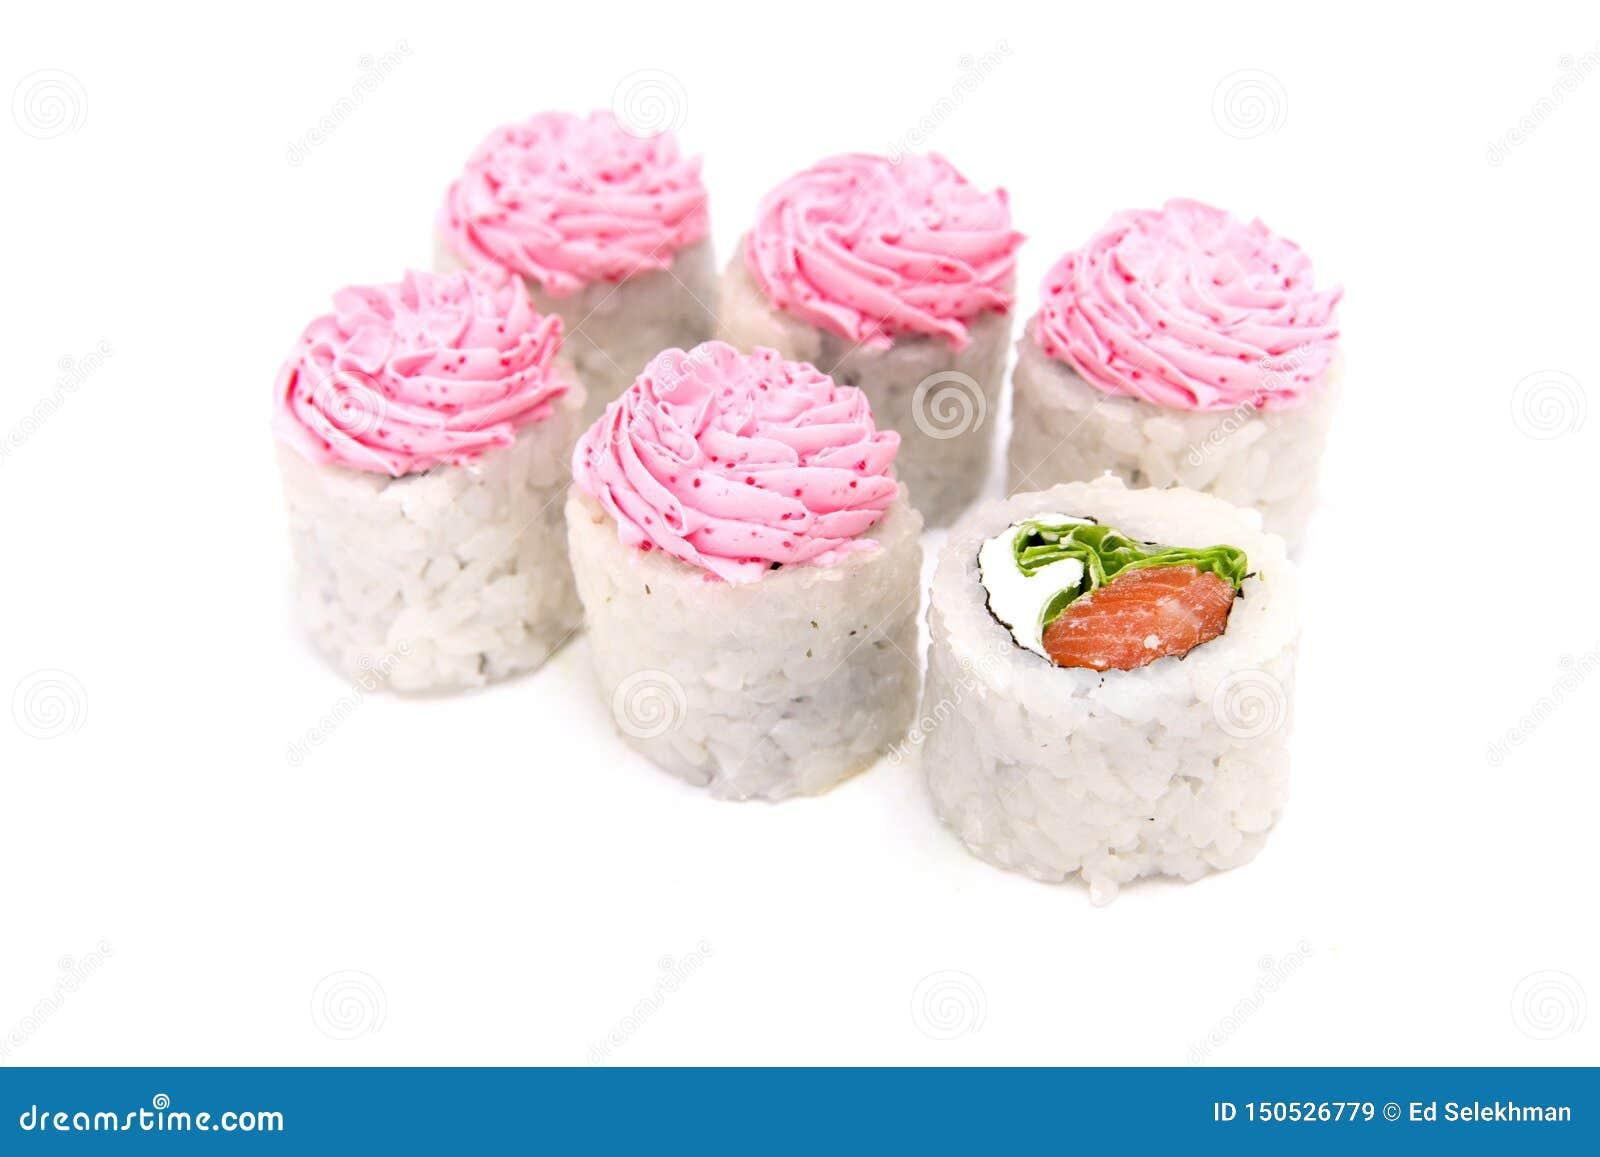 Japanse traditionele die keukenbroodjes op witte achtergrond worden geïsoleerd